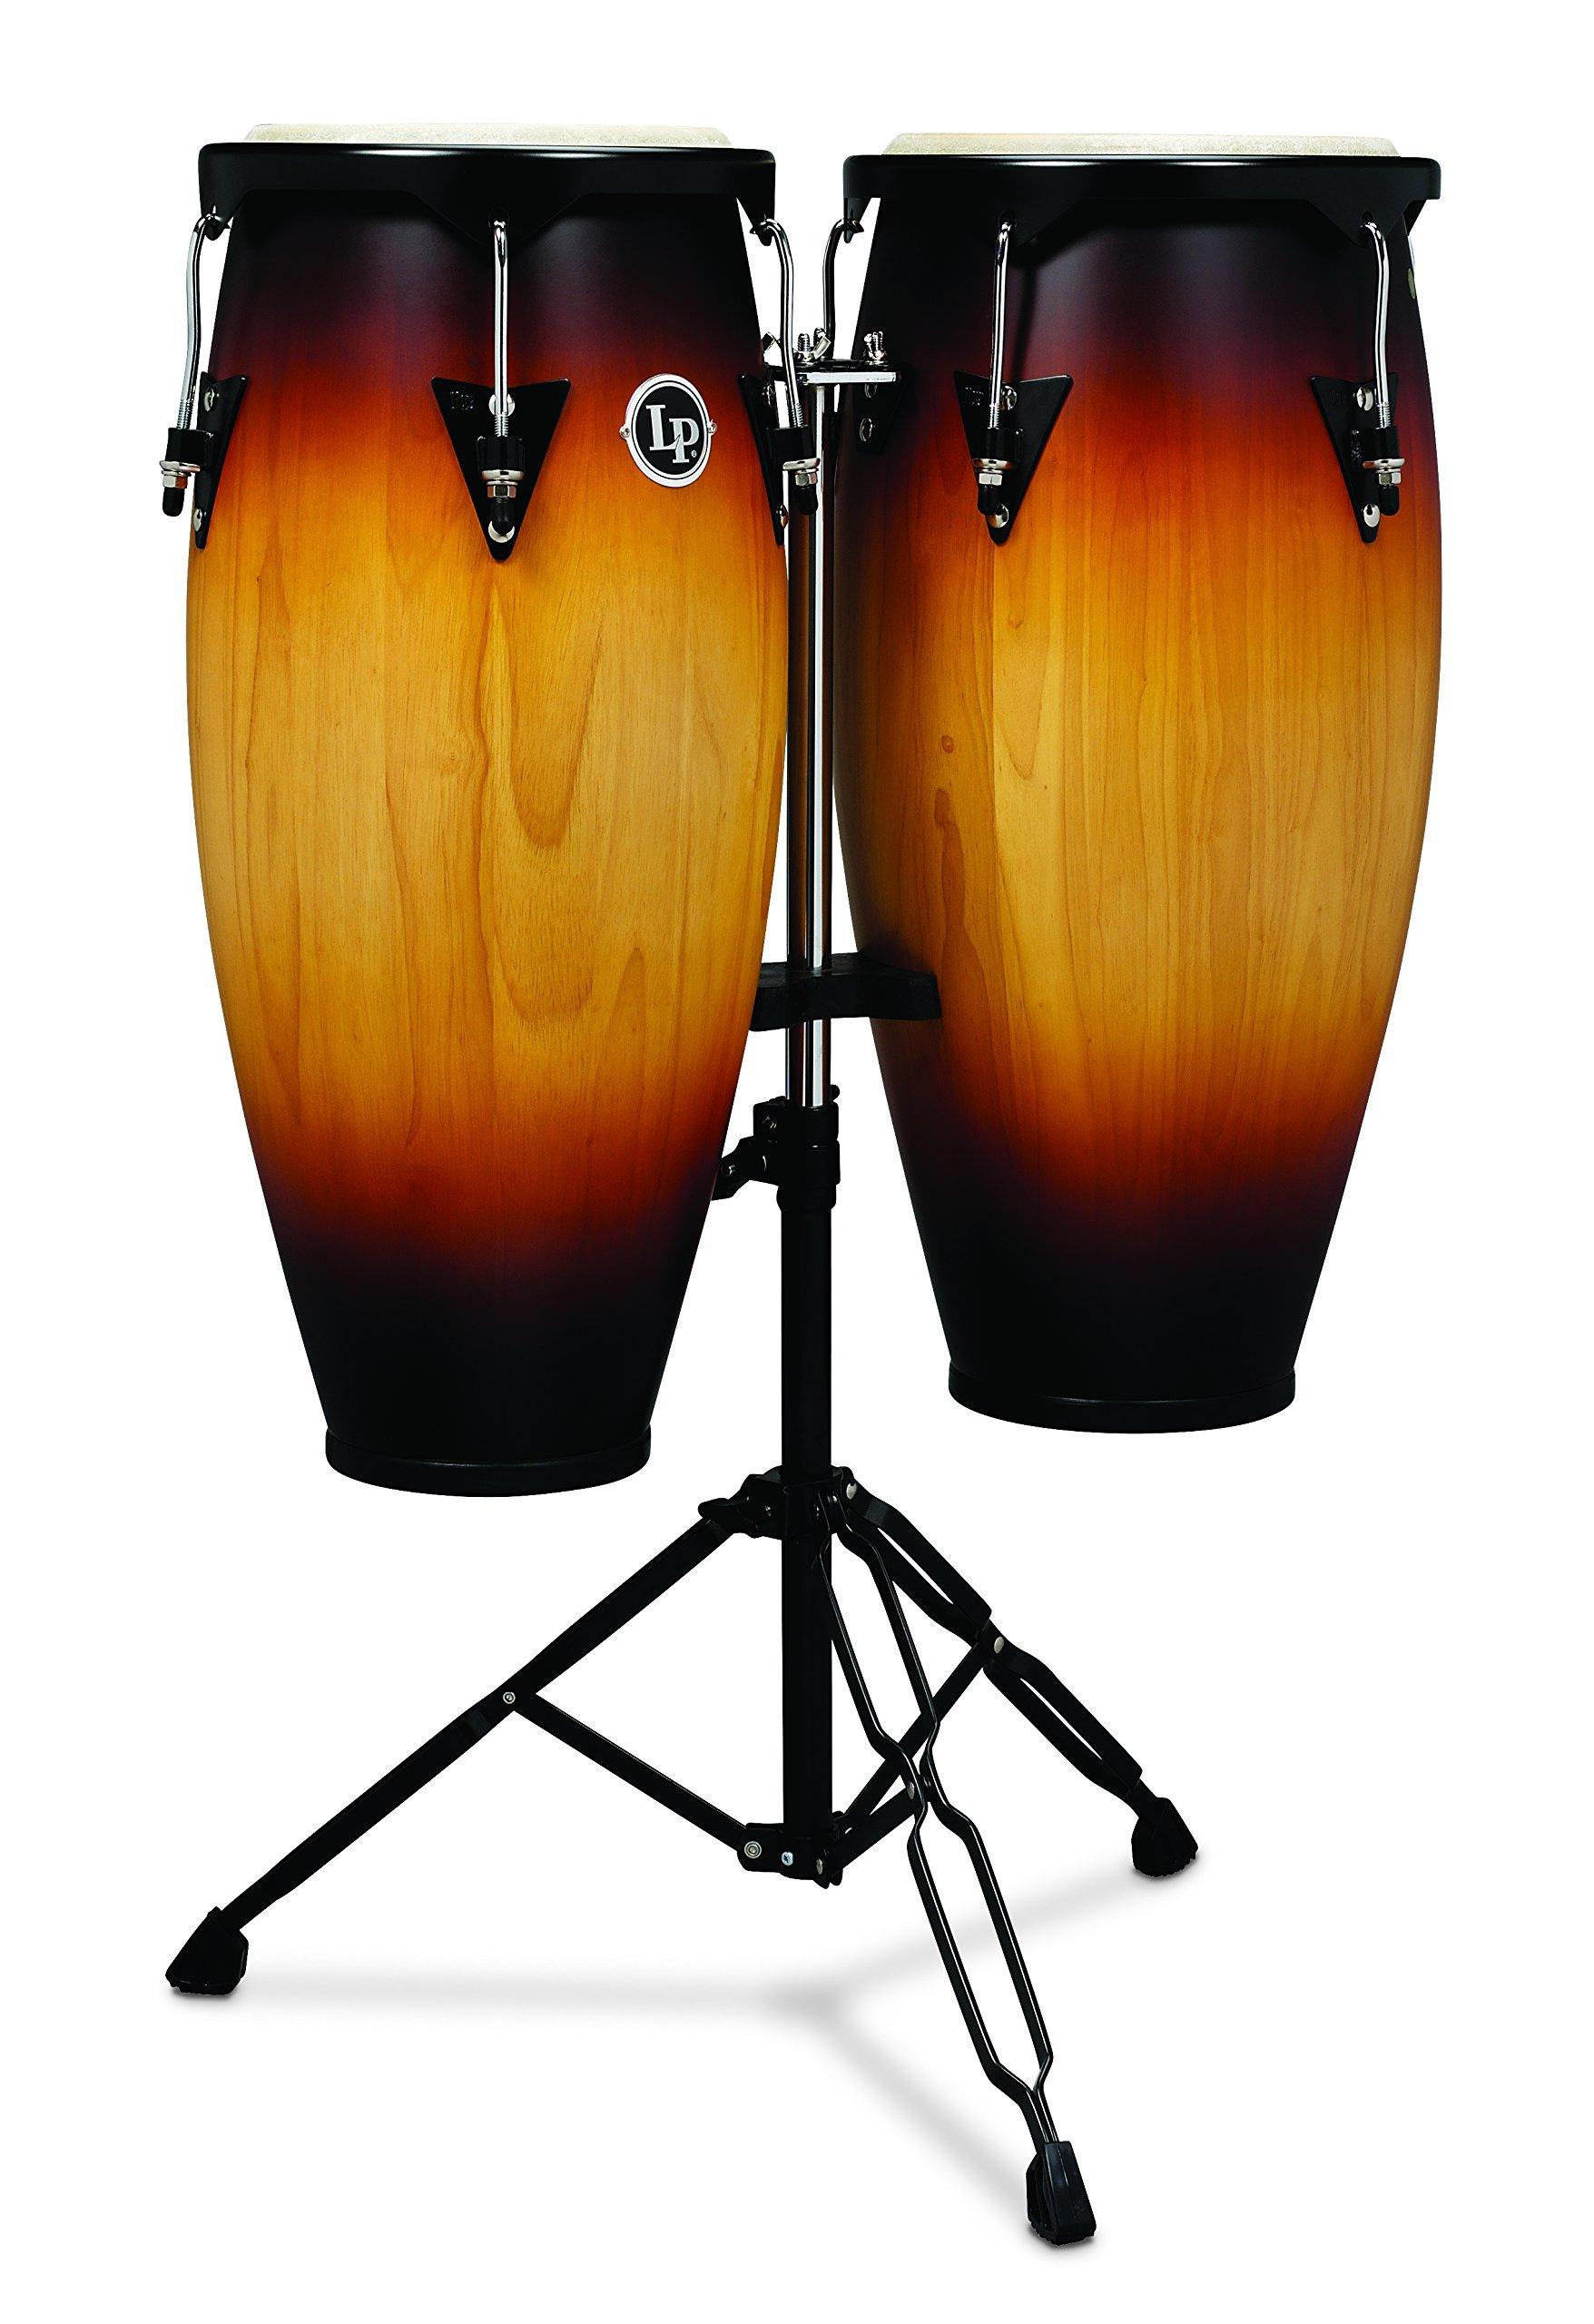 Latin Percussion LP City Wood Congas 10'' & 11'' Set - Vintage Sunburst by Latin Percussion